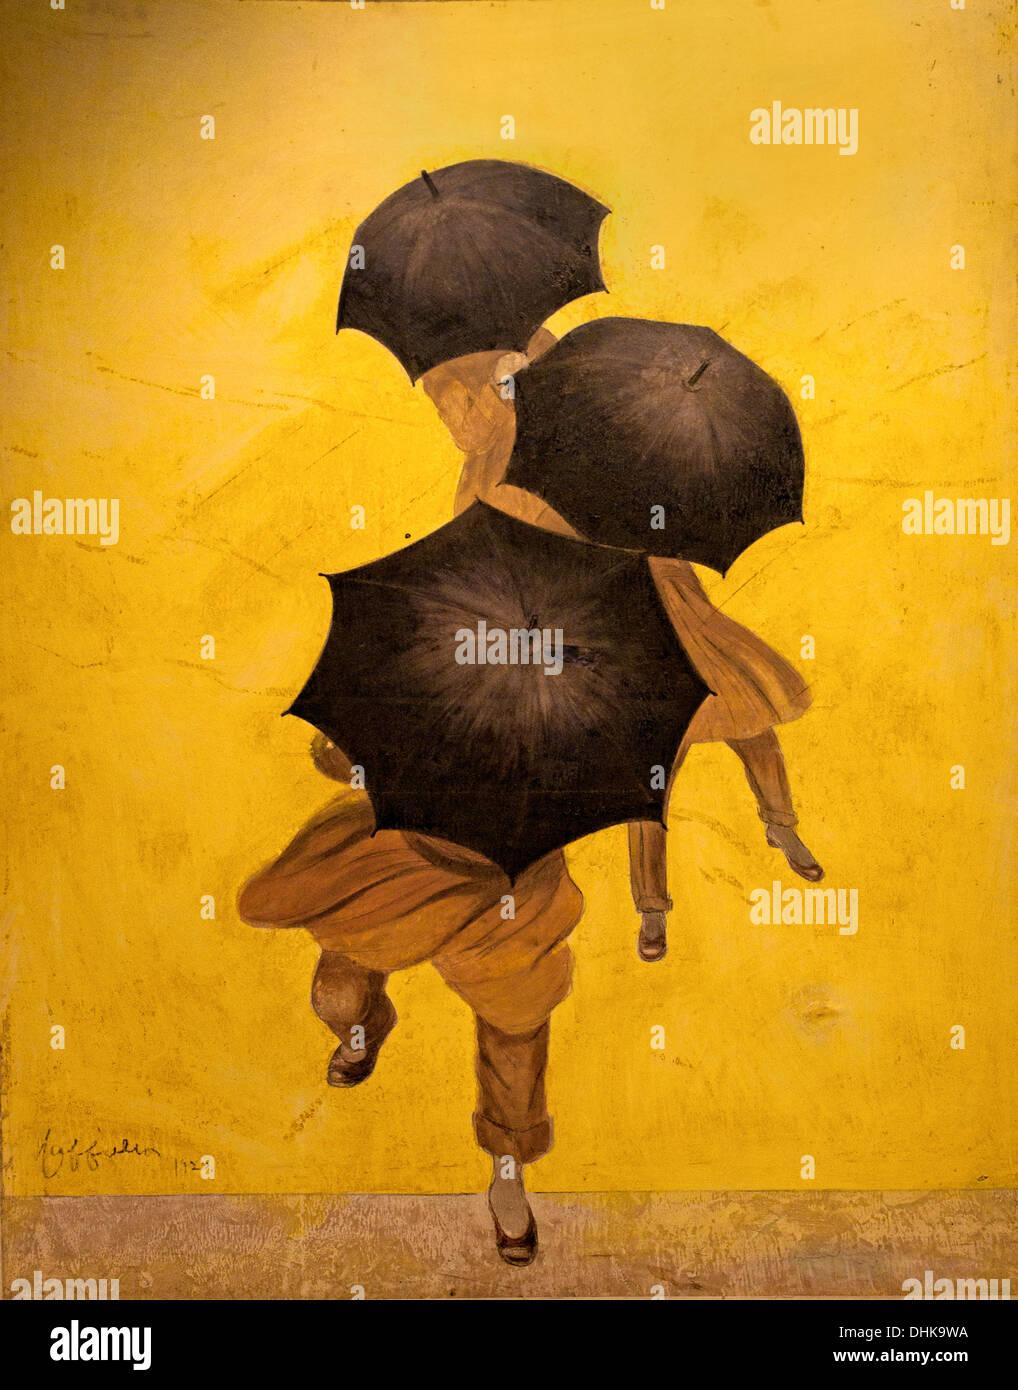 Les Parapluies Revel - Thé Sonnenschirme Revel 1922 Leonetto Cappiello 1875-1942 Italien Stockbild